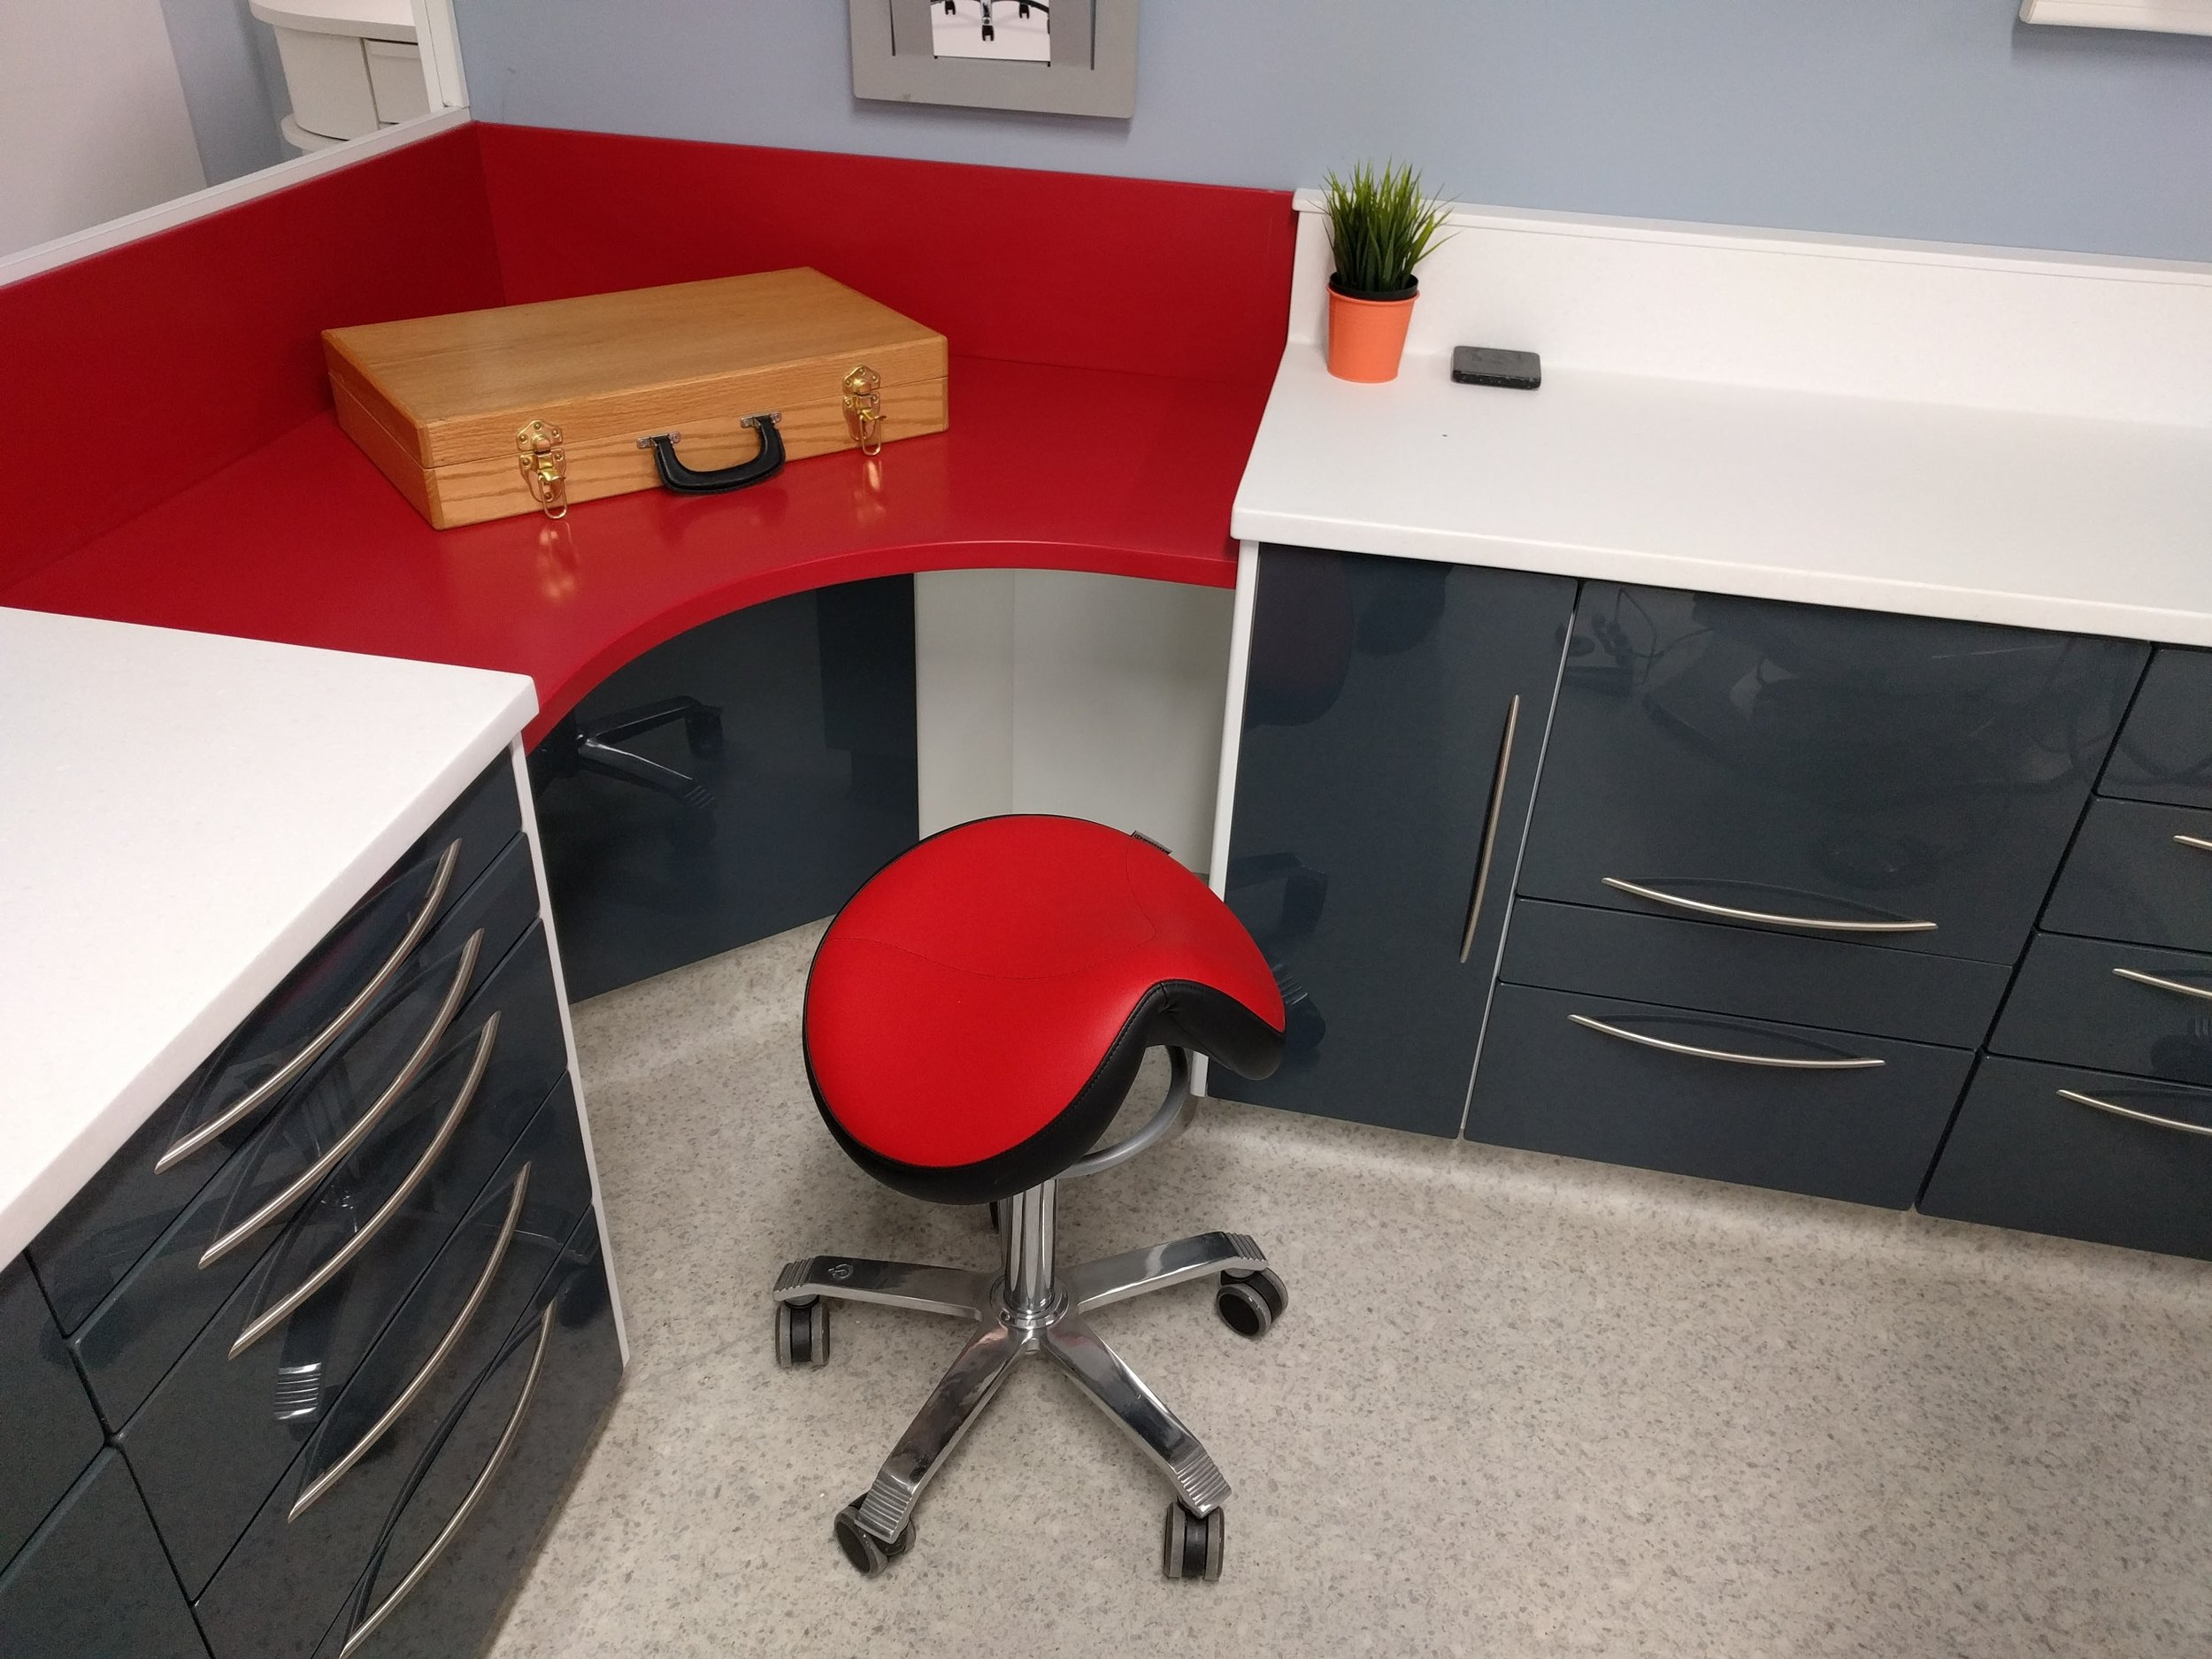 red room 3.jpg